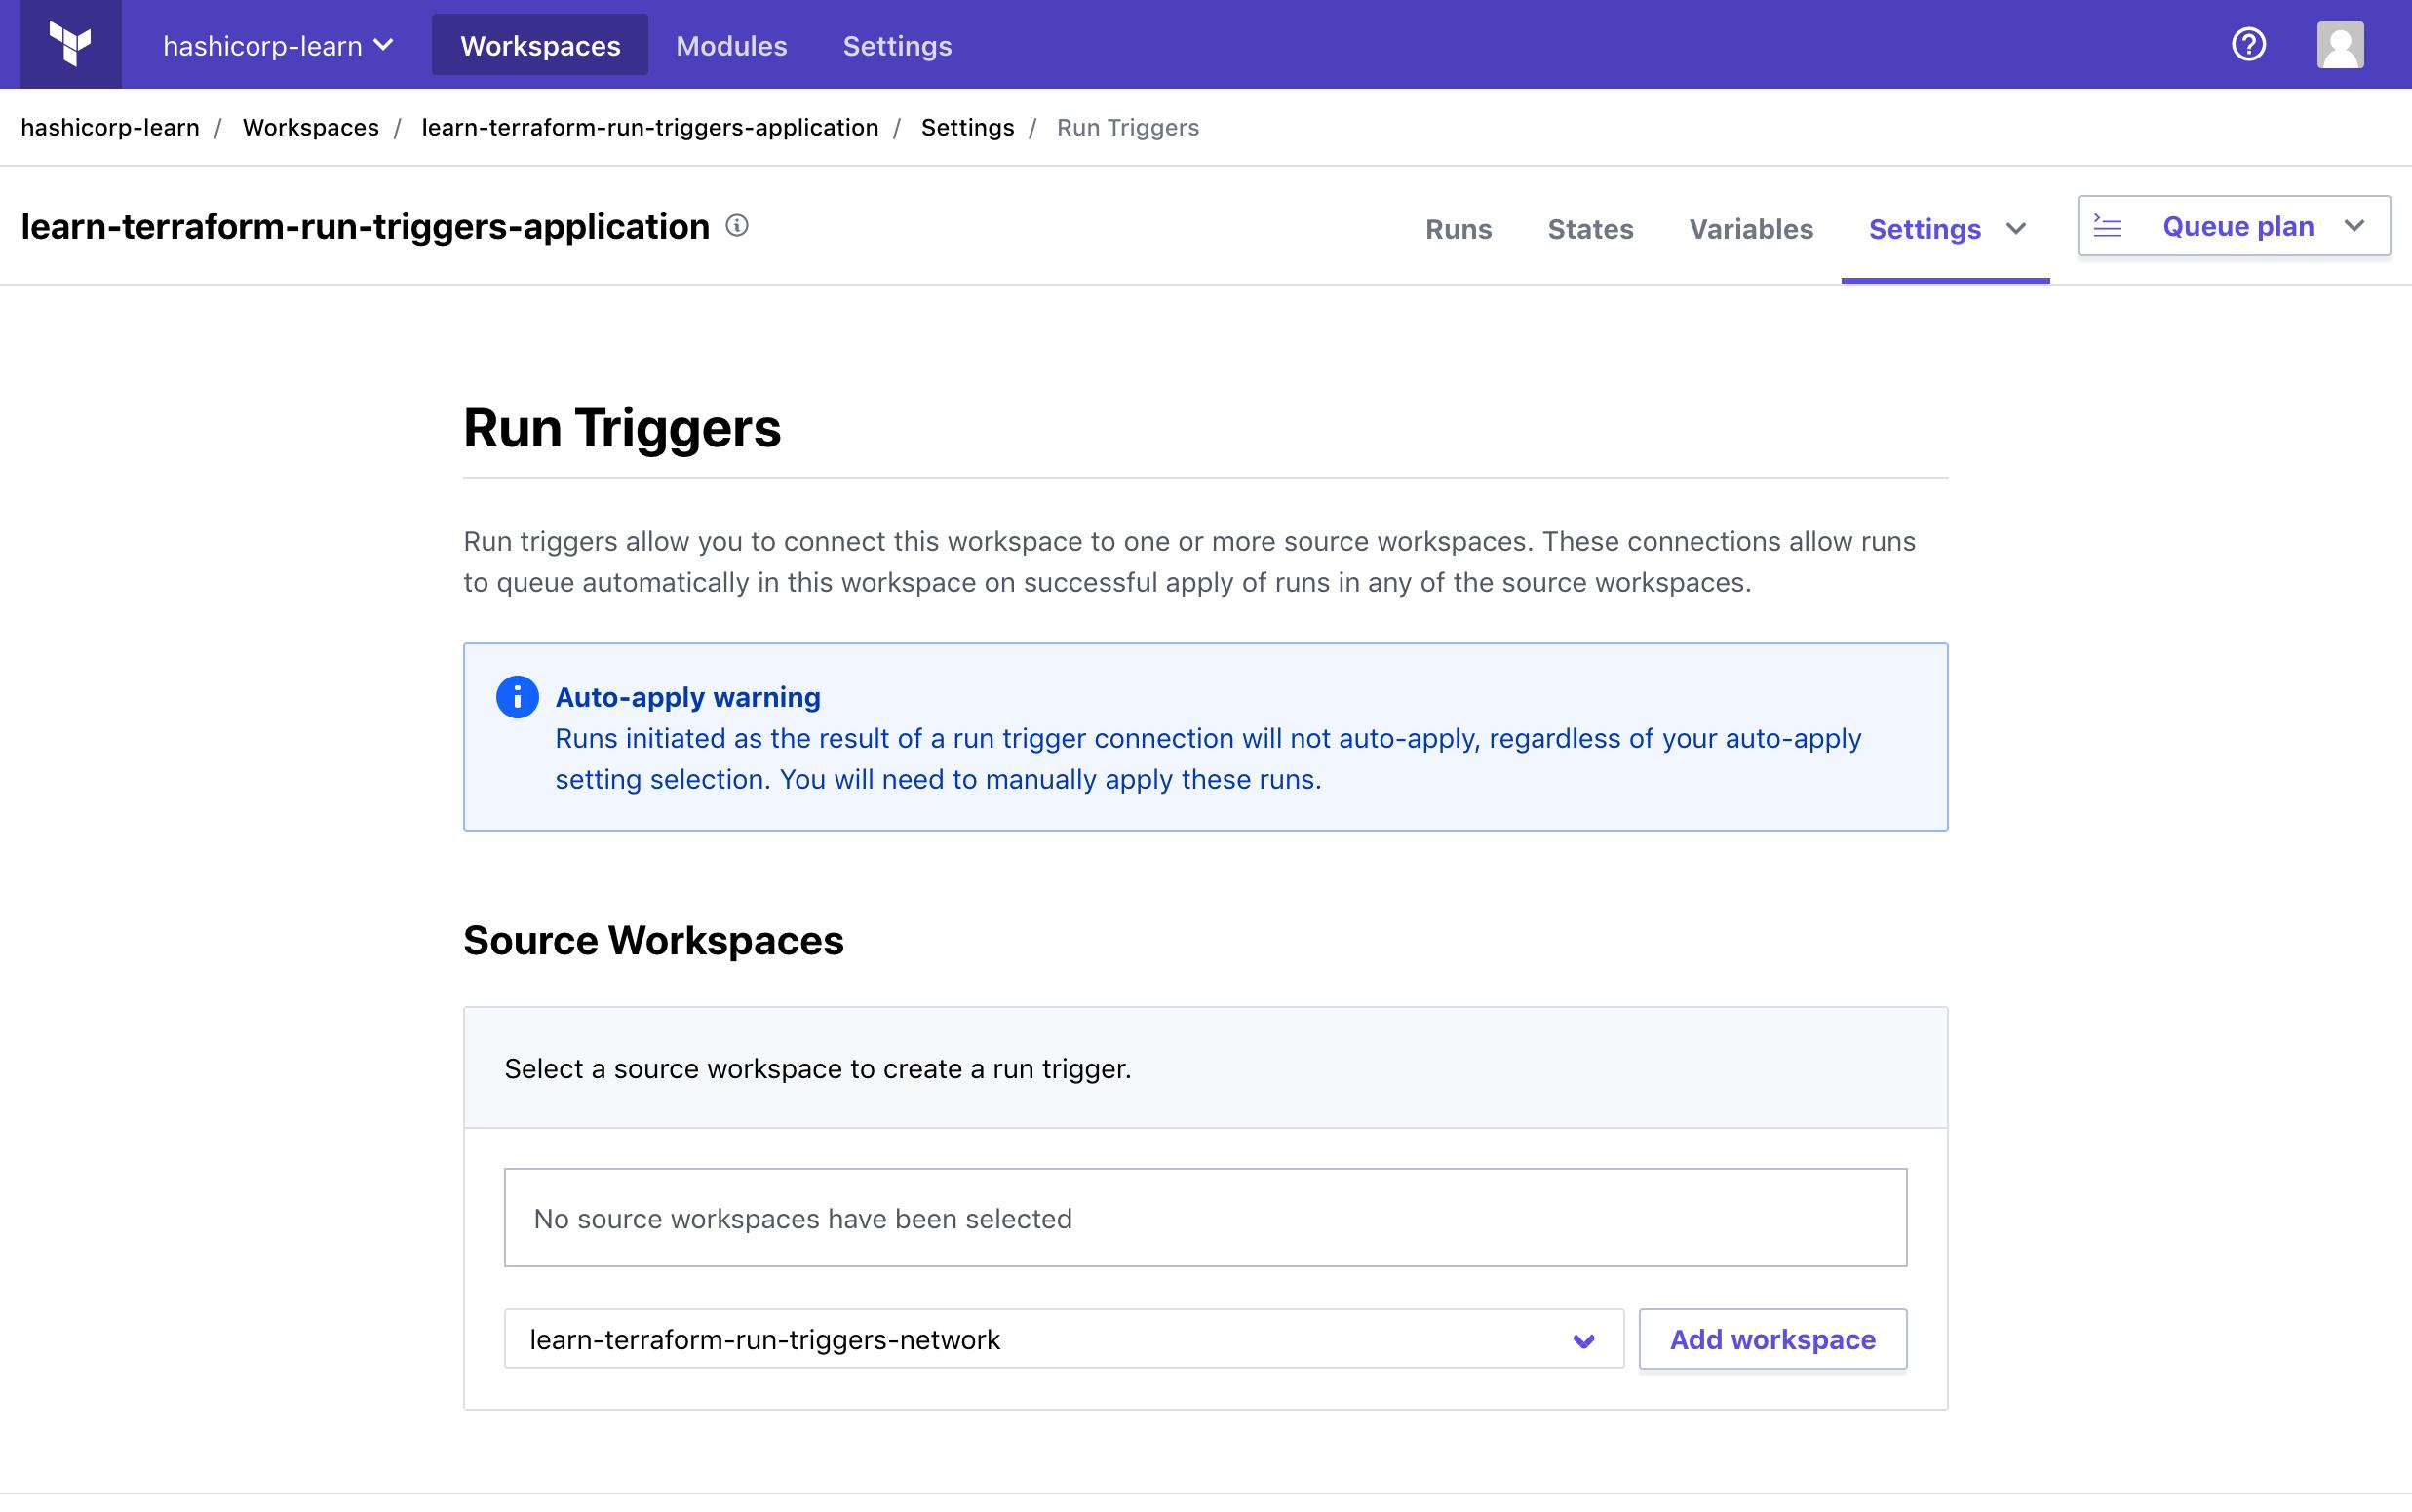 Run triggers interface